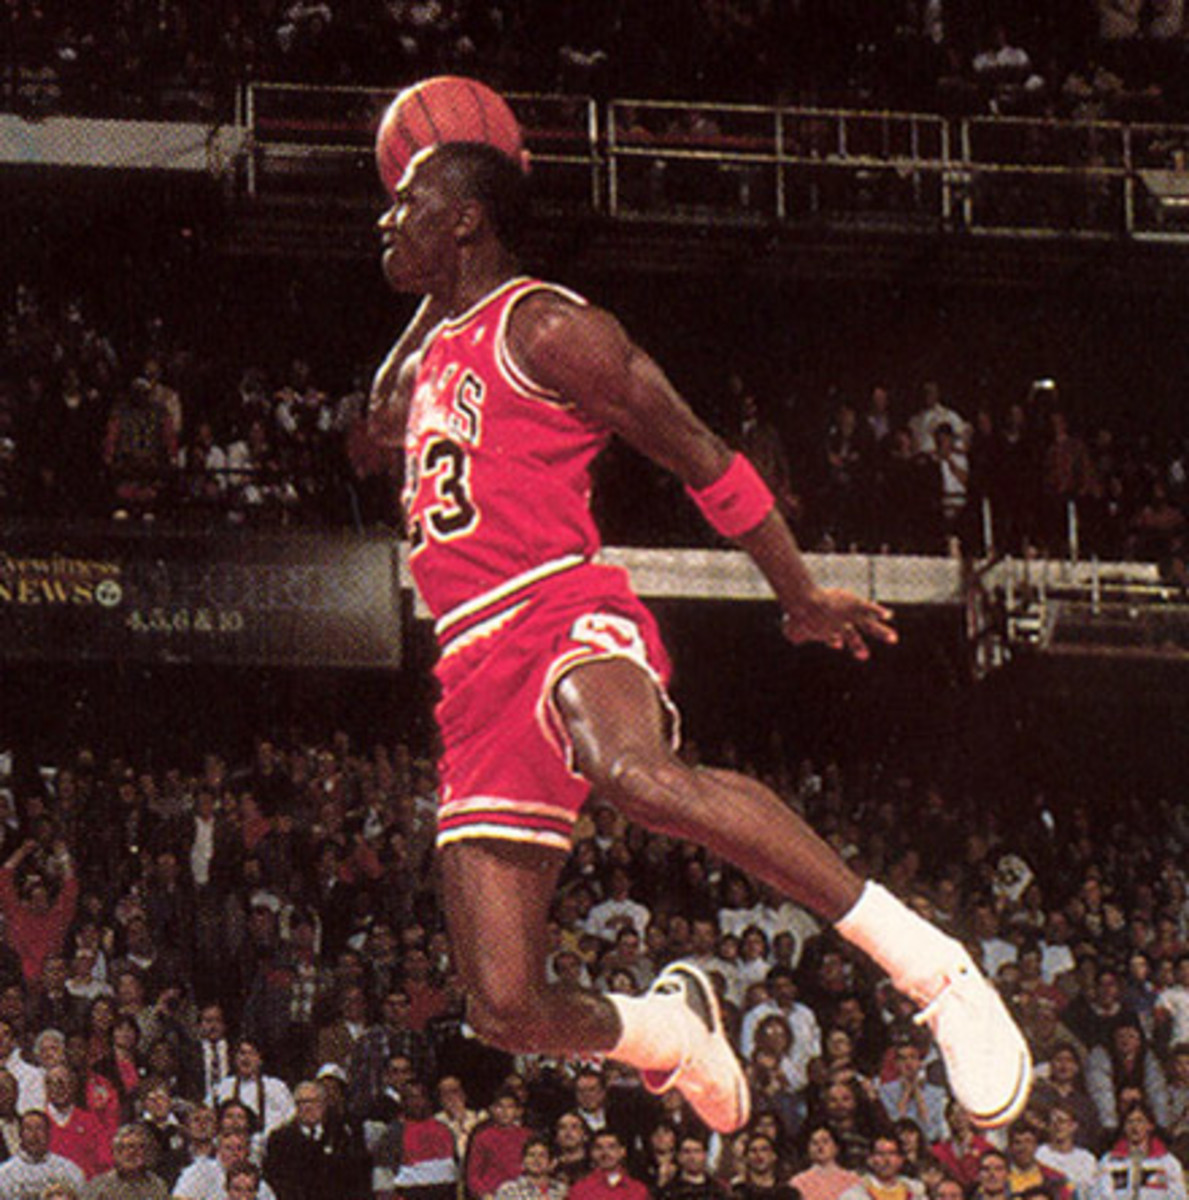 NBA Slam Dunk Contest Champions